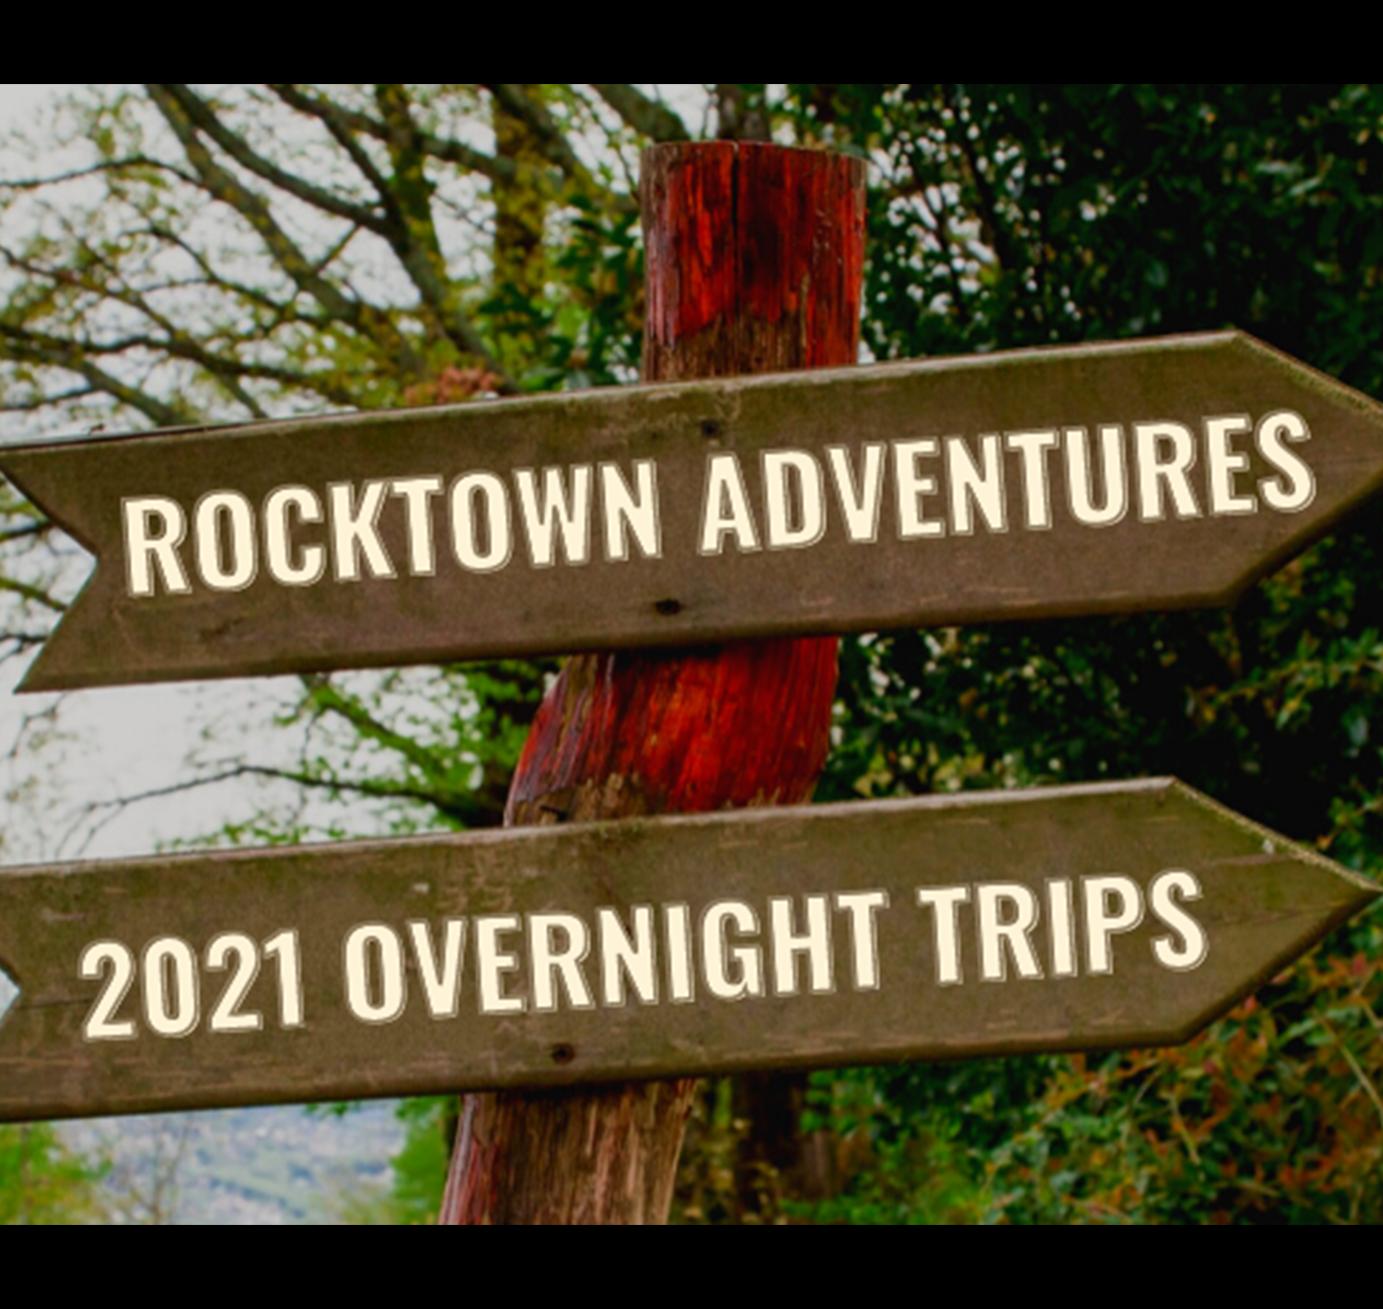 Rocktown Adventures | 2021 Overnight Trips